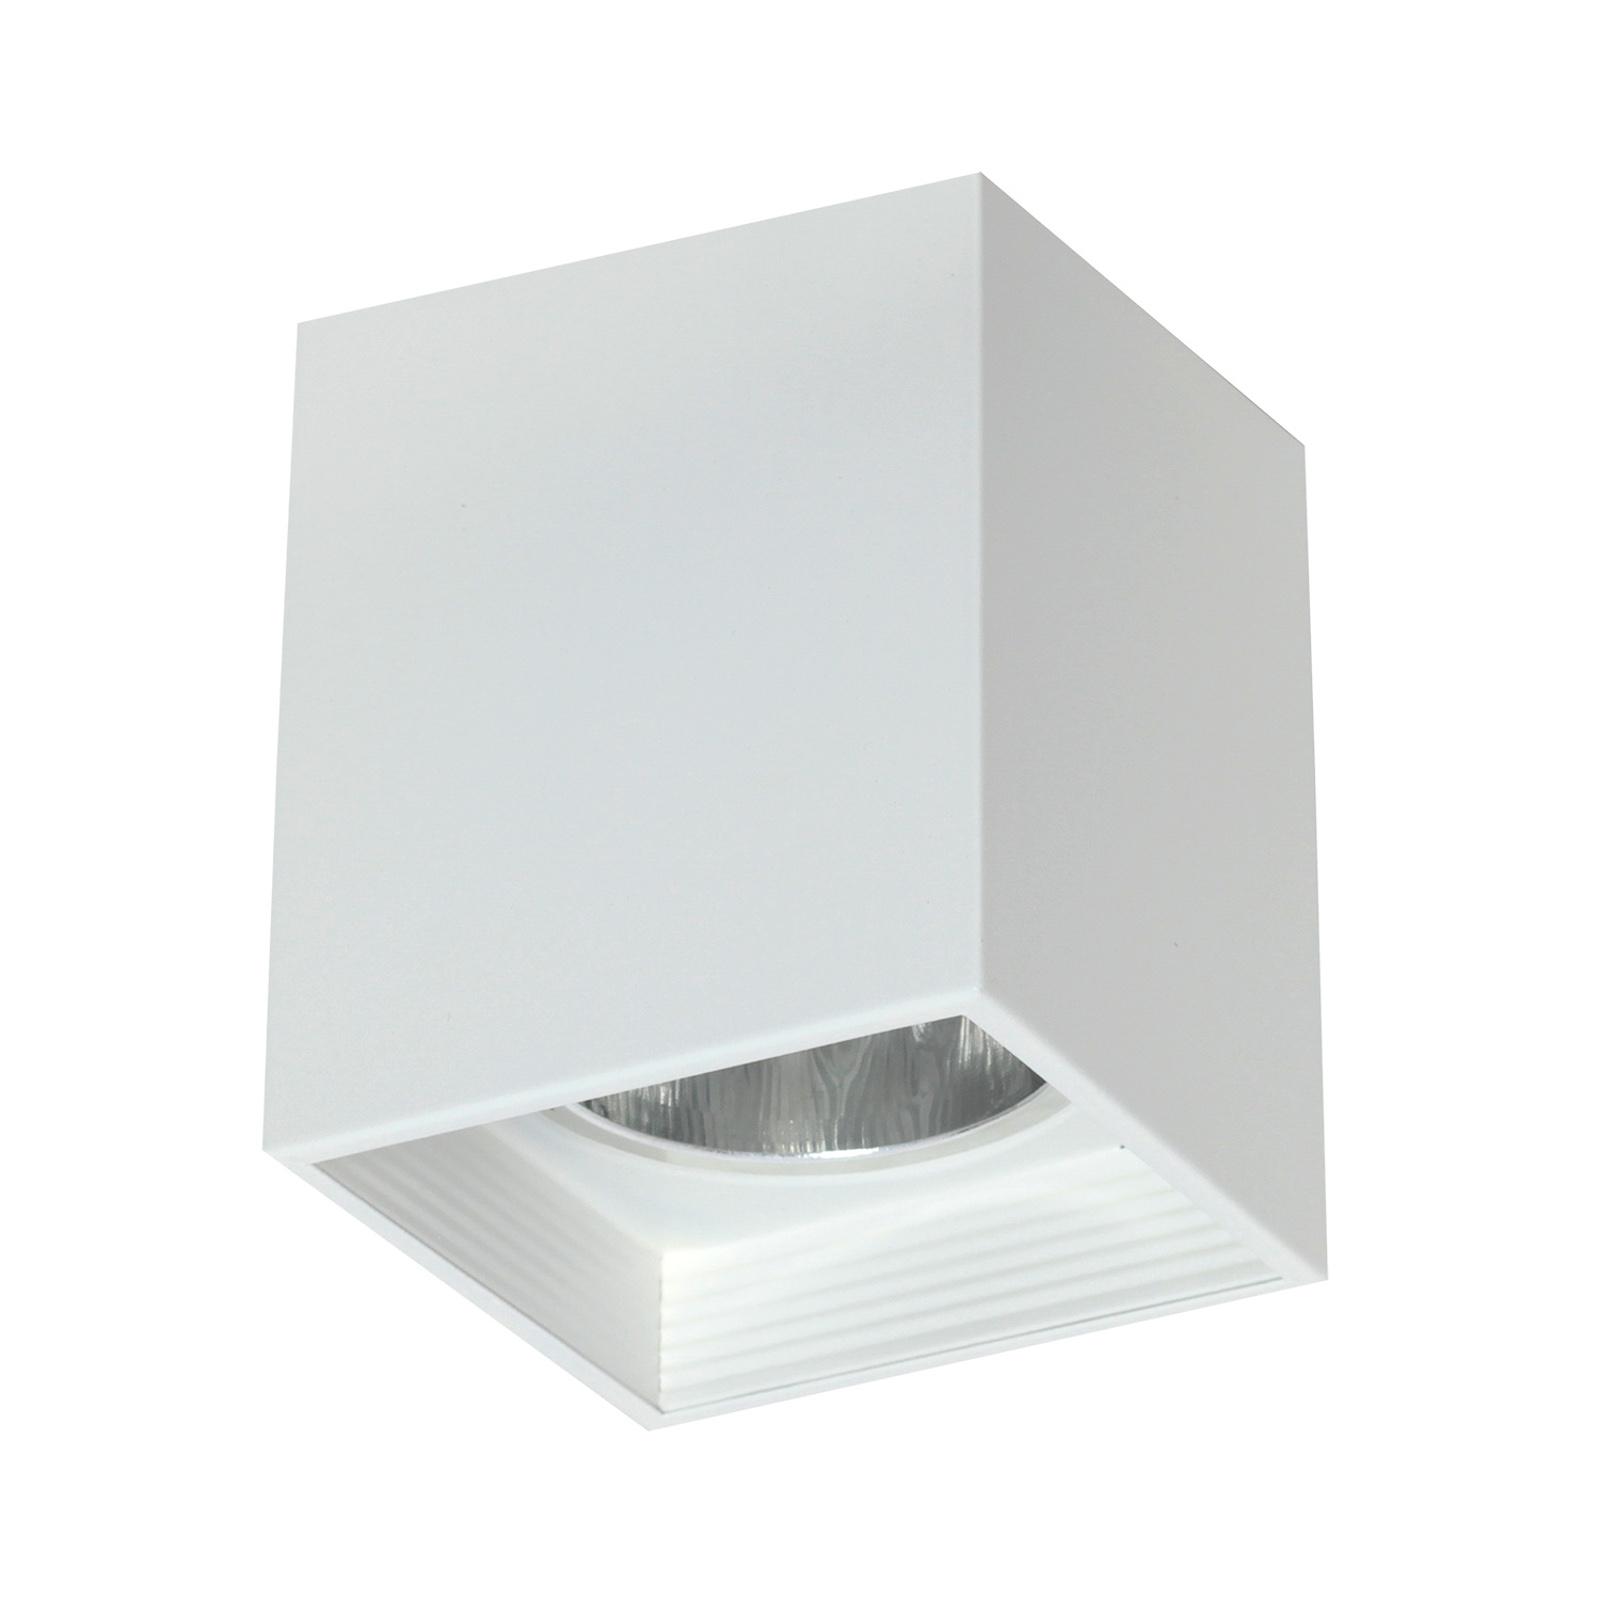 Kattolamppu Downlight square valkoinen, L 9,2 cm